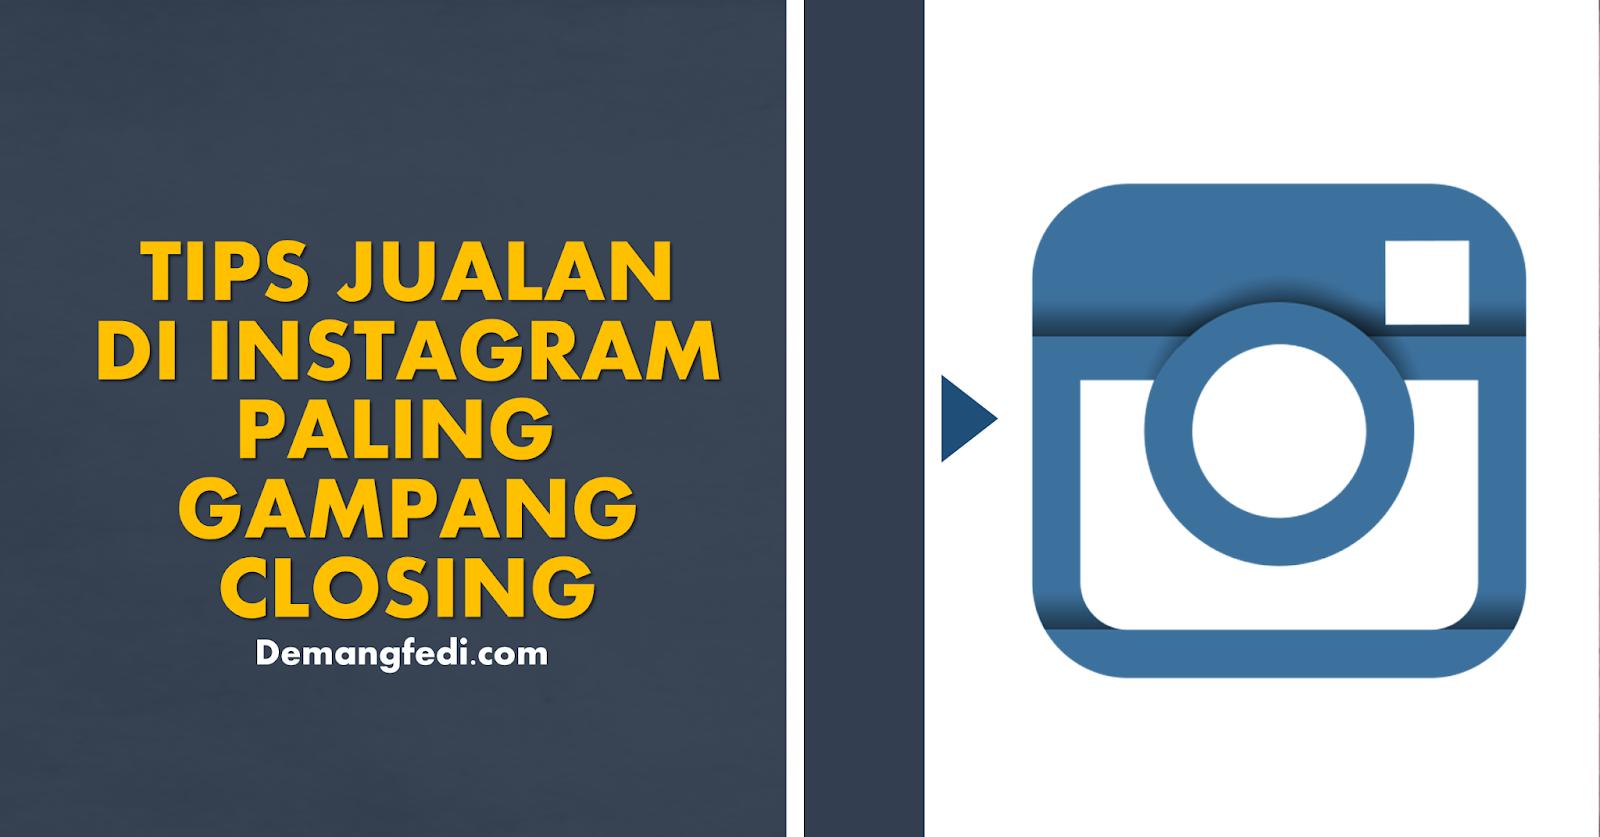 Tips Jualan di Instagram Paling Gampang Closing